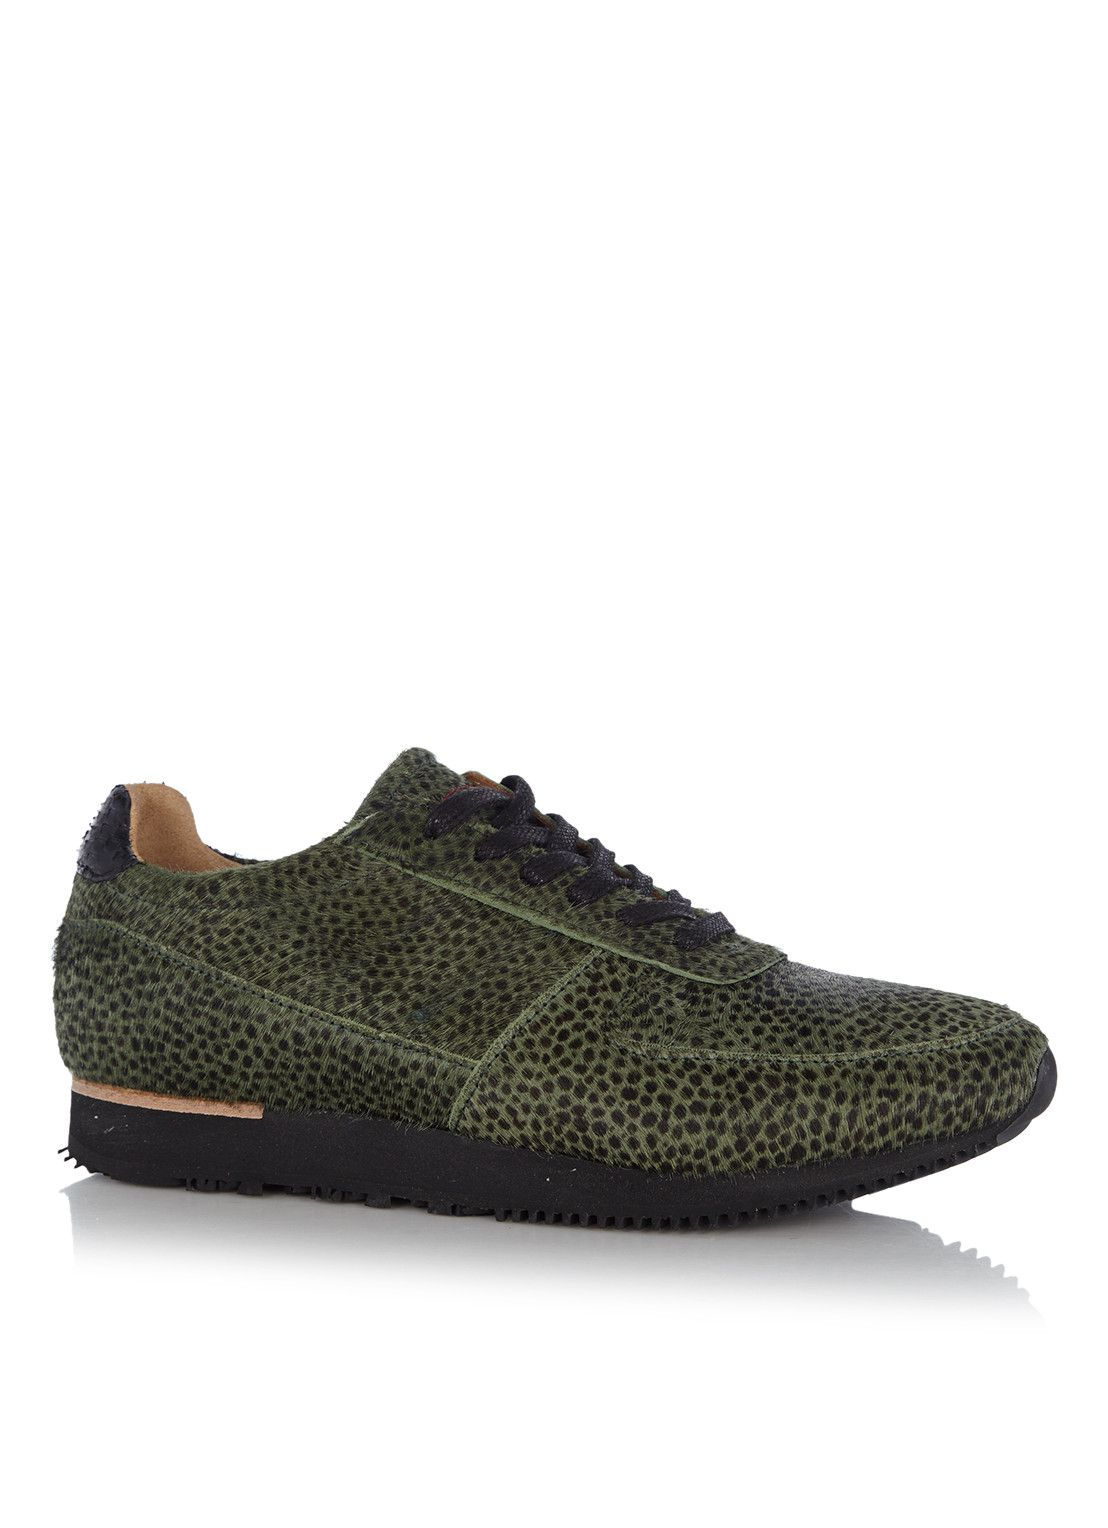 Fretons By Fred De La Bretoniere Ponyhair Sneaker Animalprint Dress Shoes Men Oxford Shoes Cole Haan Zerogrand Oxford